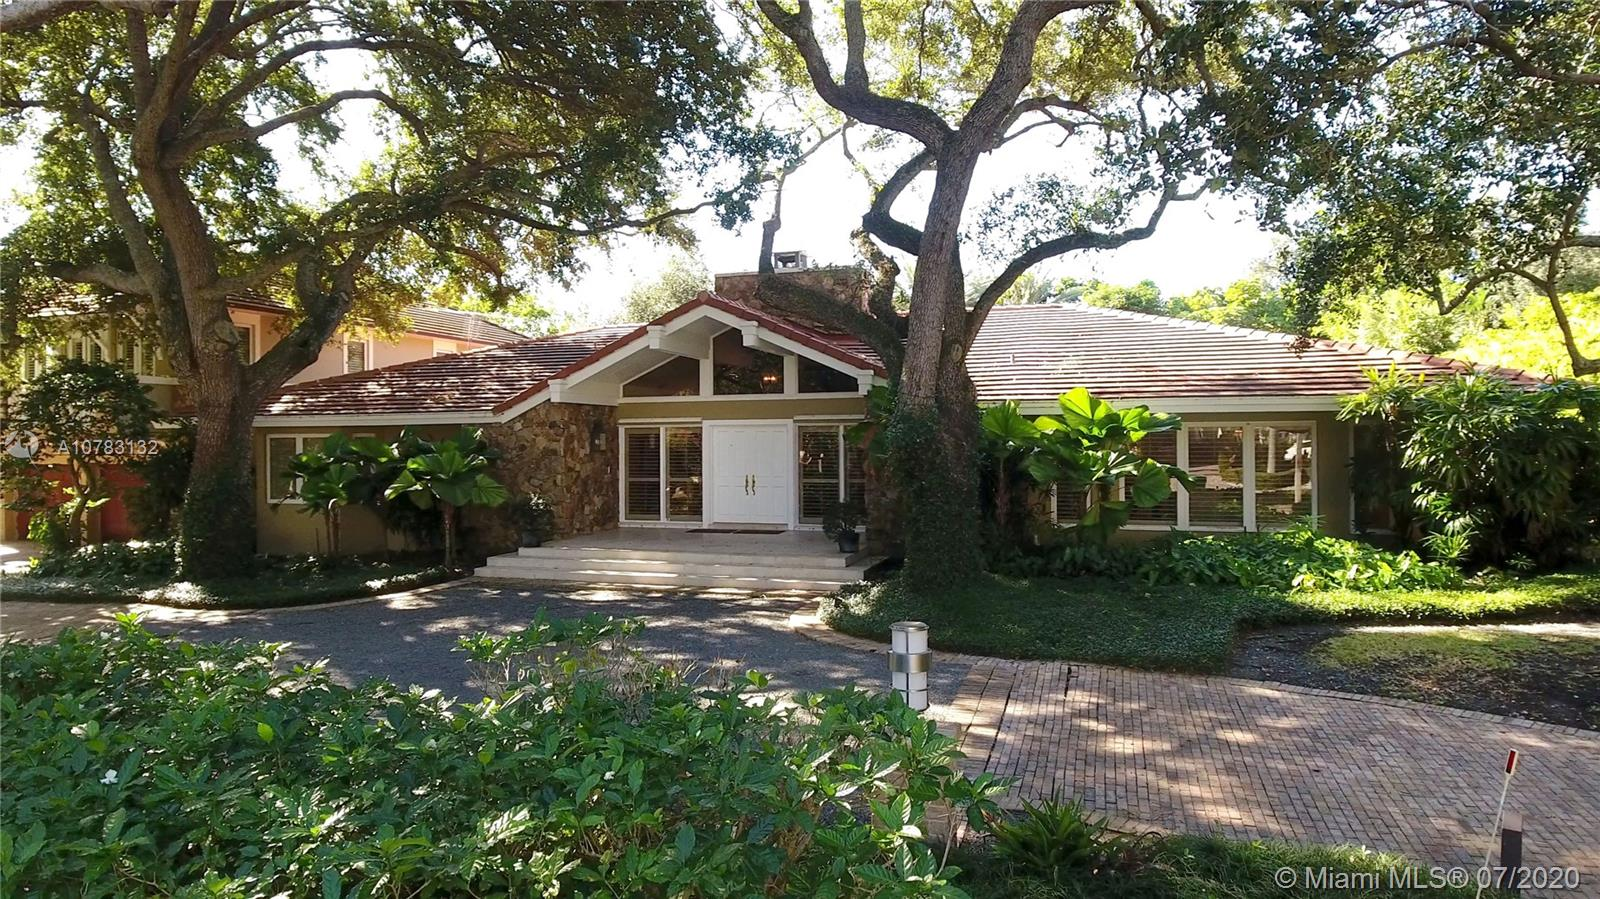 300 Cocoplum Rd, Coral Gables, Florida